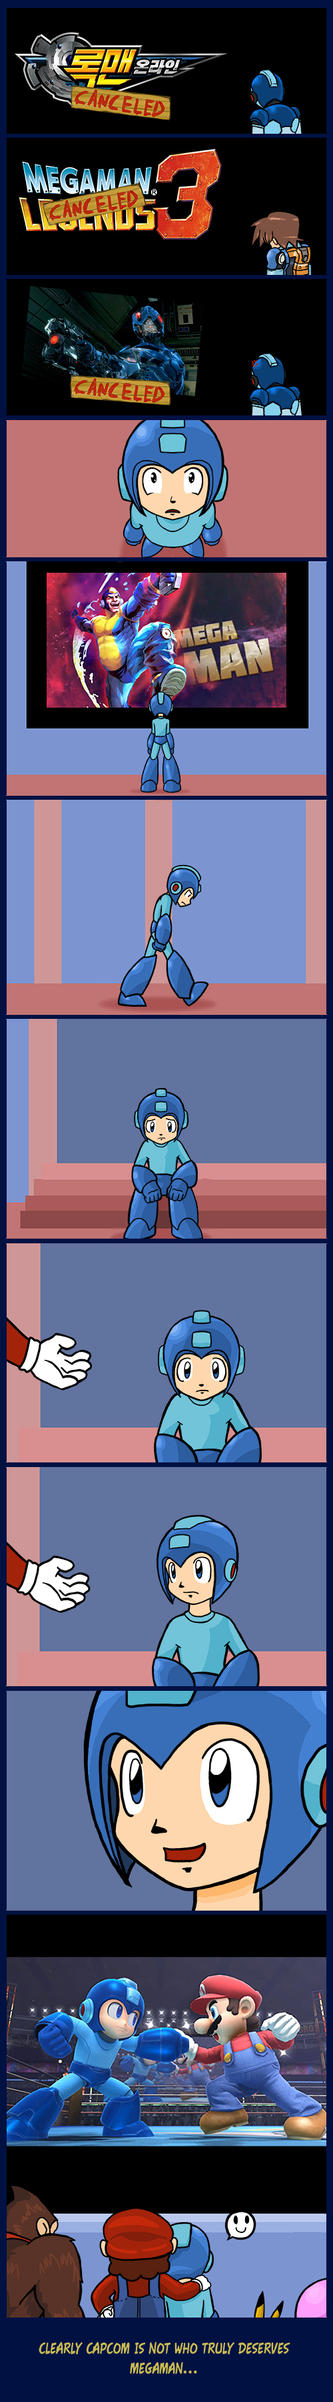 One for Megaman by Camilo-sama